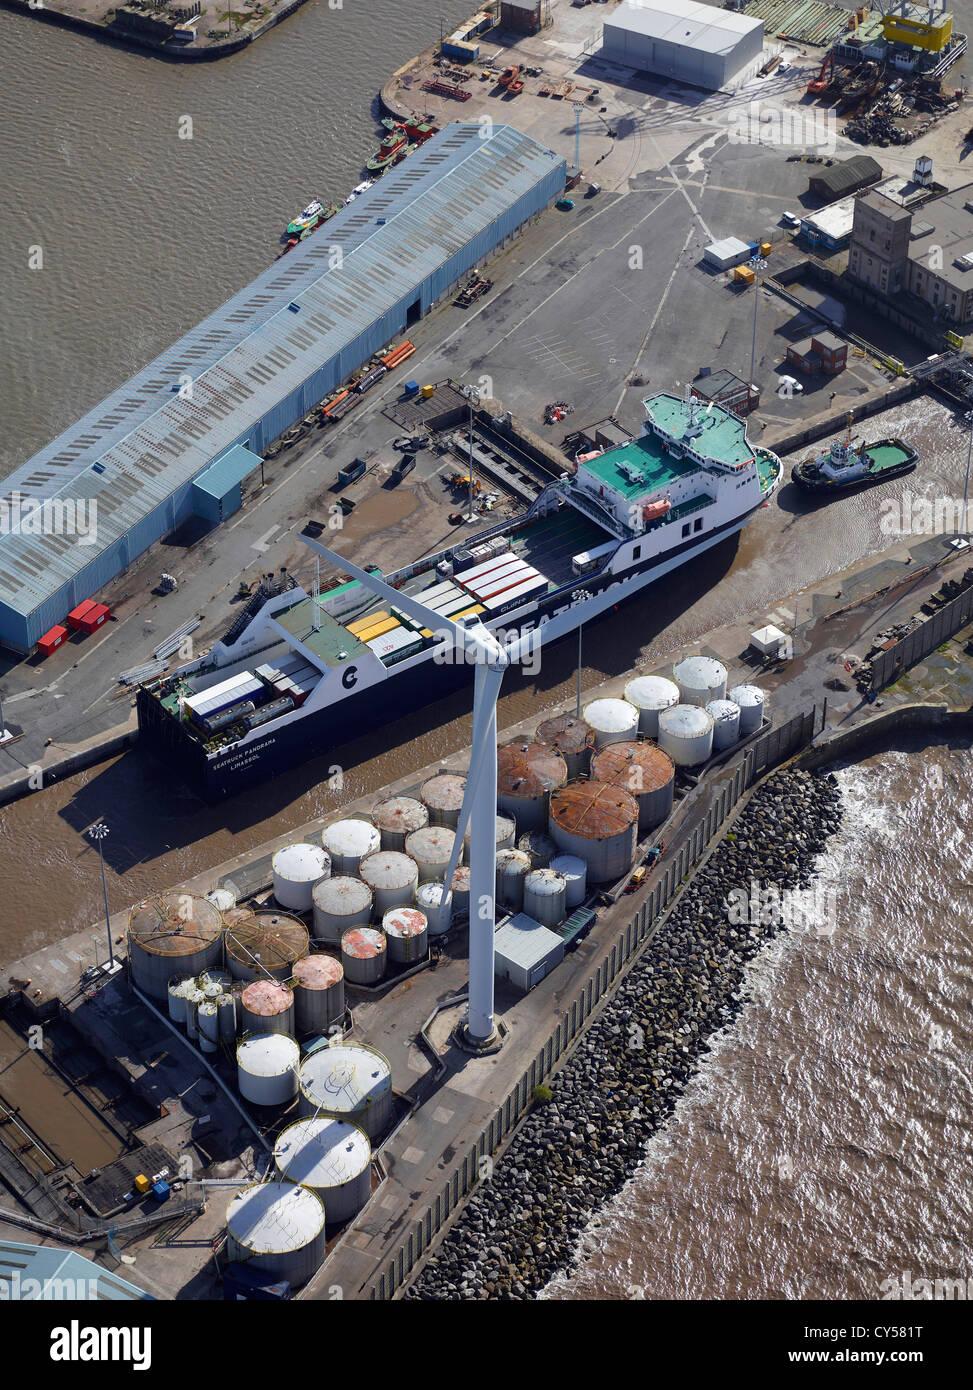 Windkraftanlage bei Liverpool Docks, Merseyside, North West England, UK Stockbild